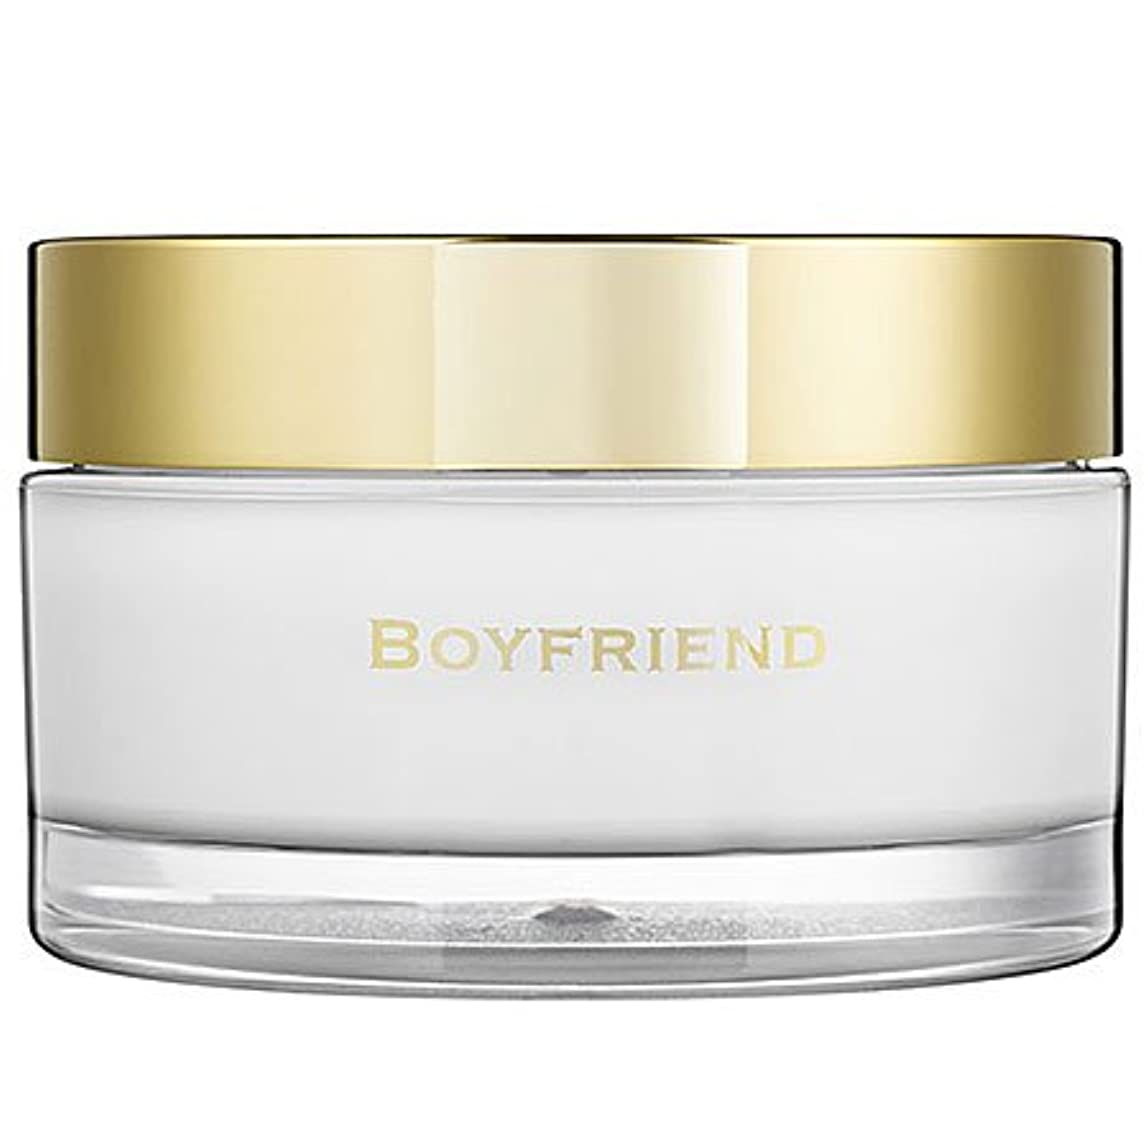 Boyfriend (ボーイフレンド) 6.7 oz (200ml) Body Cream by Kate Walsh for Women